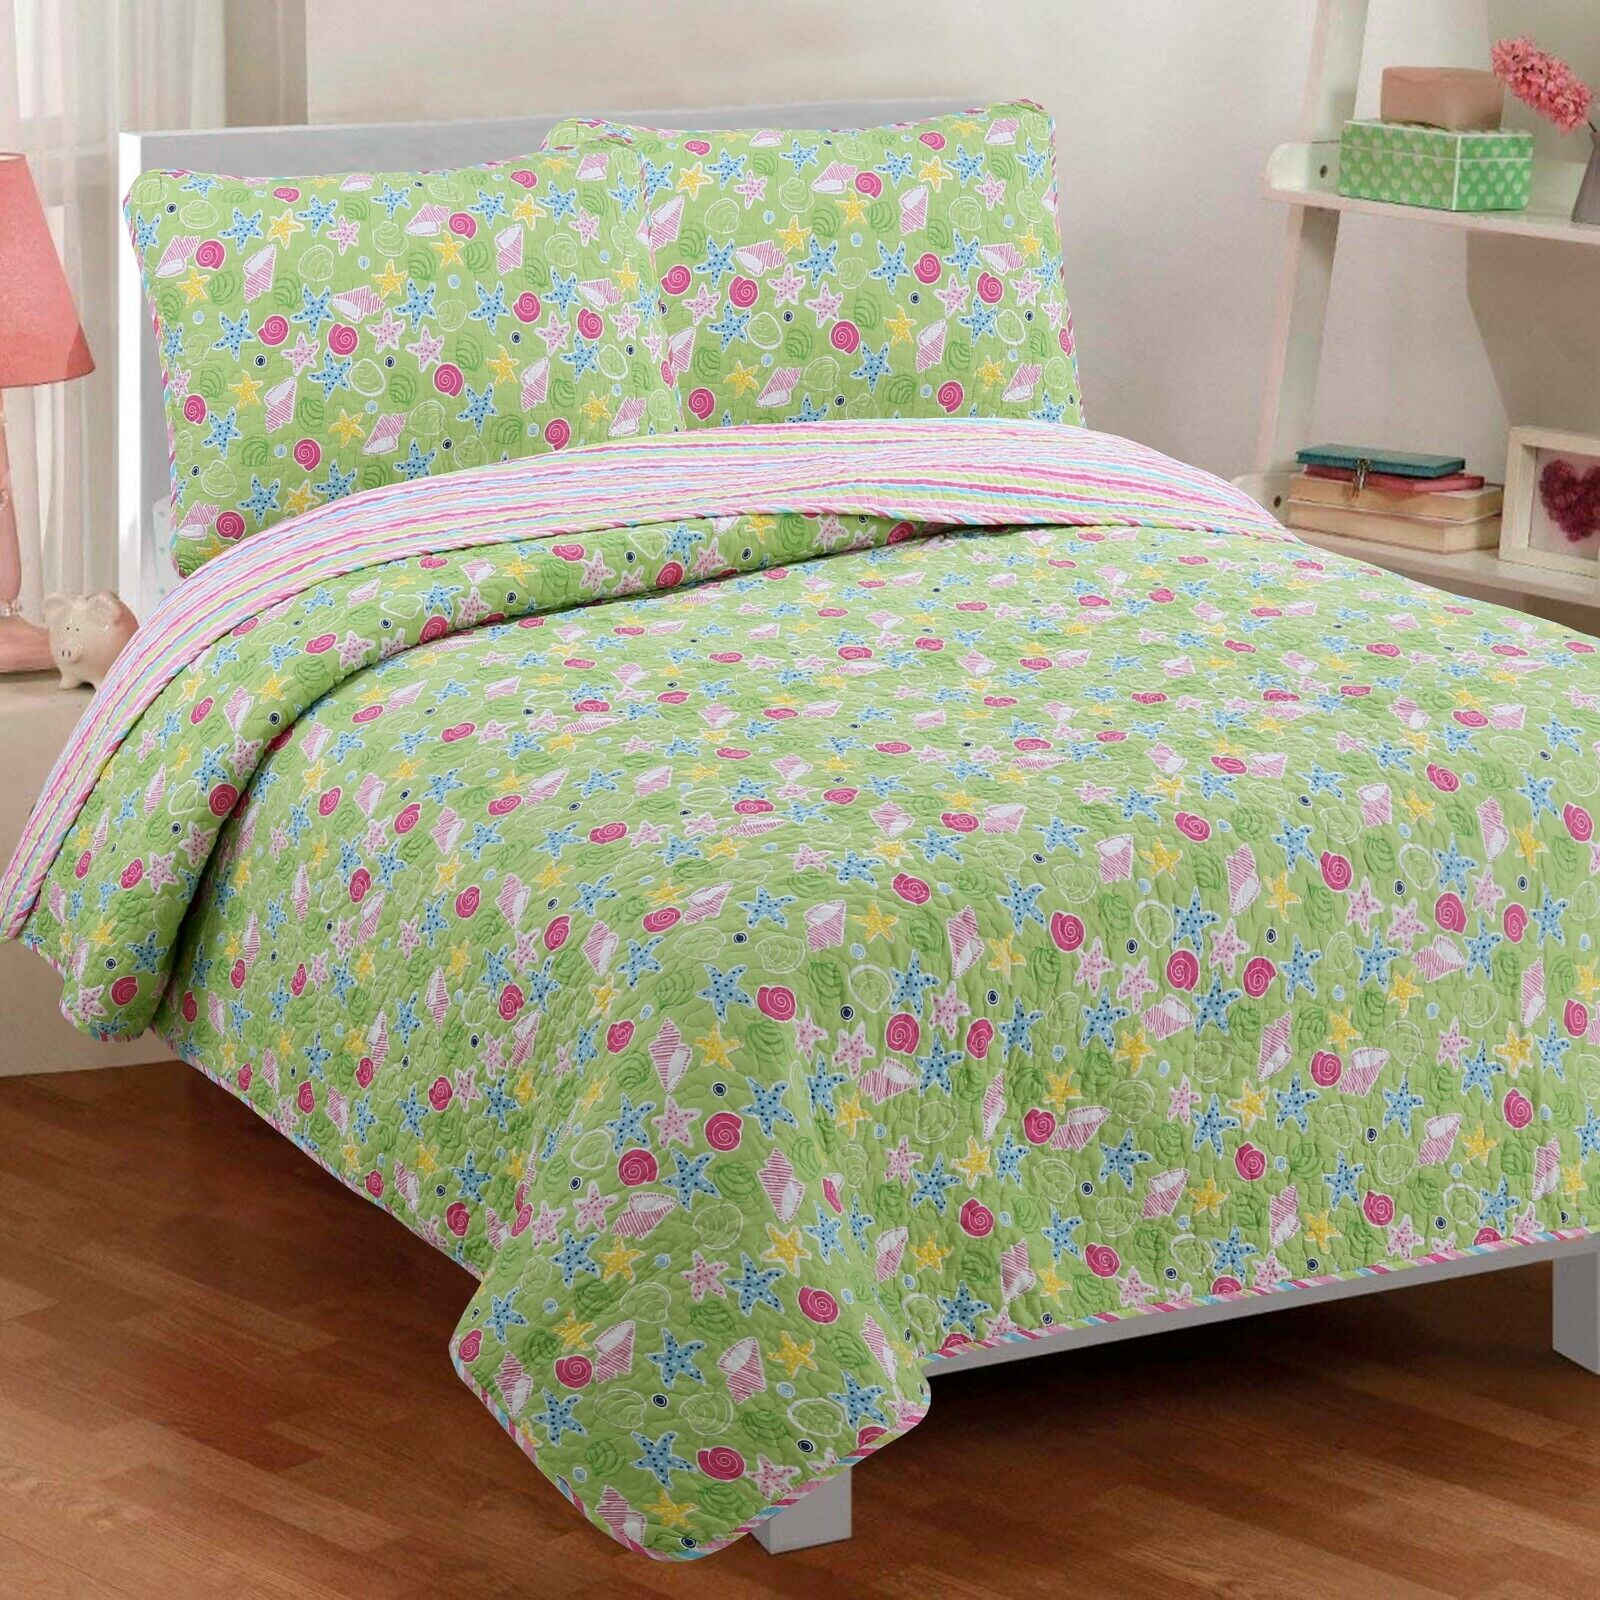 Danford Reversible Cotton Quilt Set, Bedspread, Coverlet